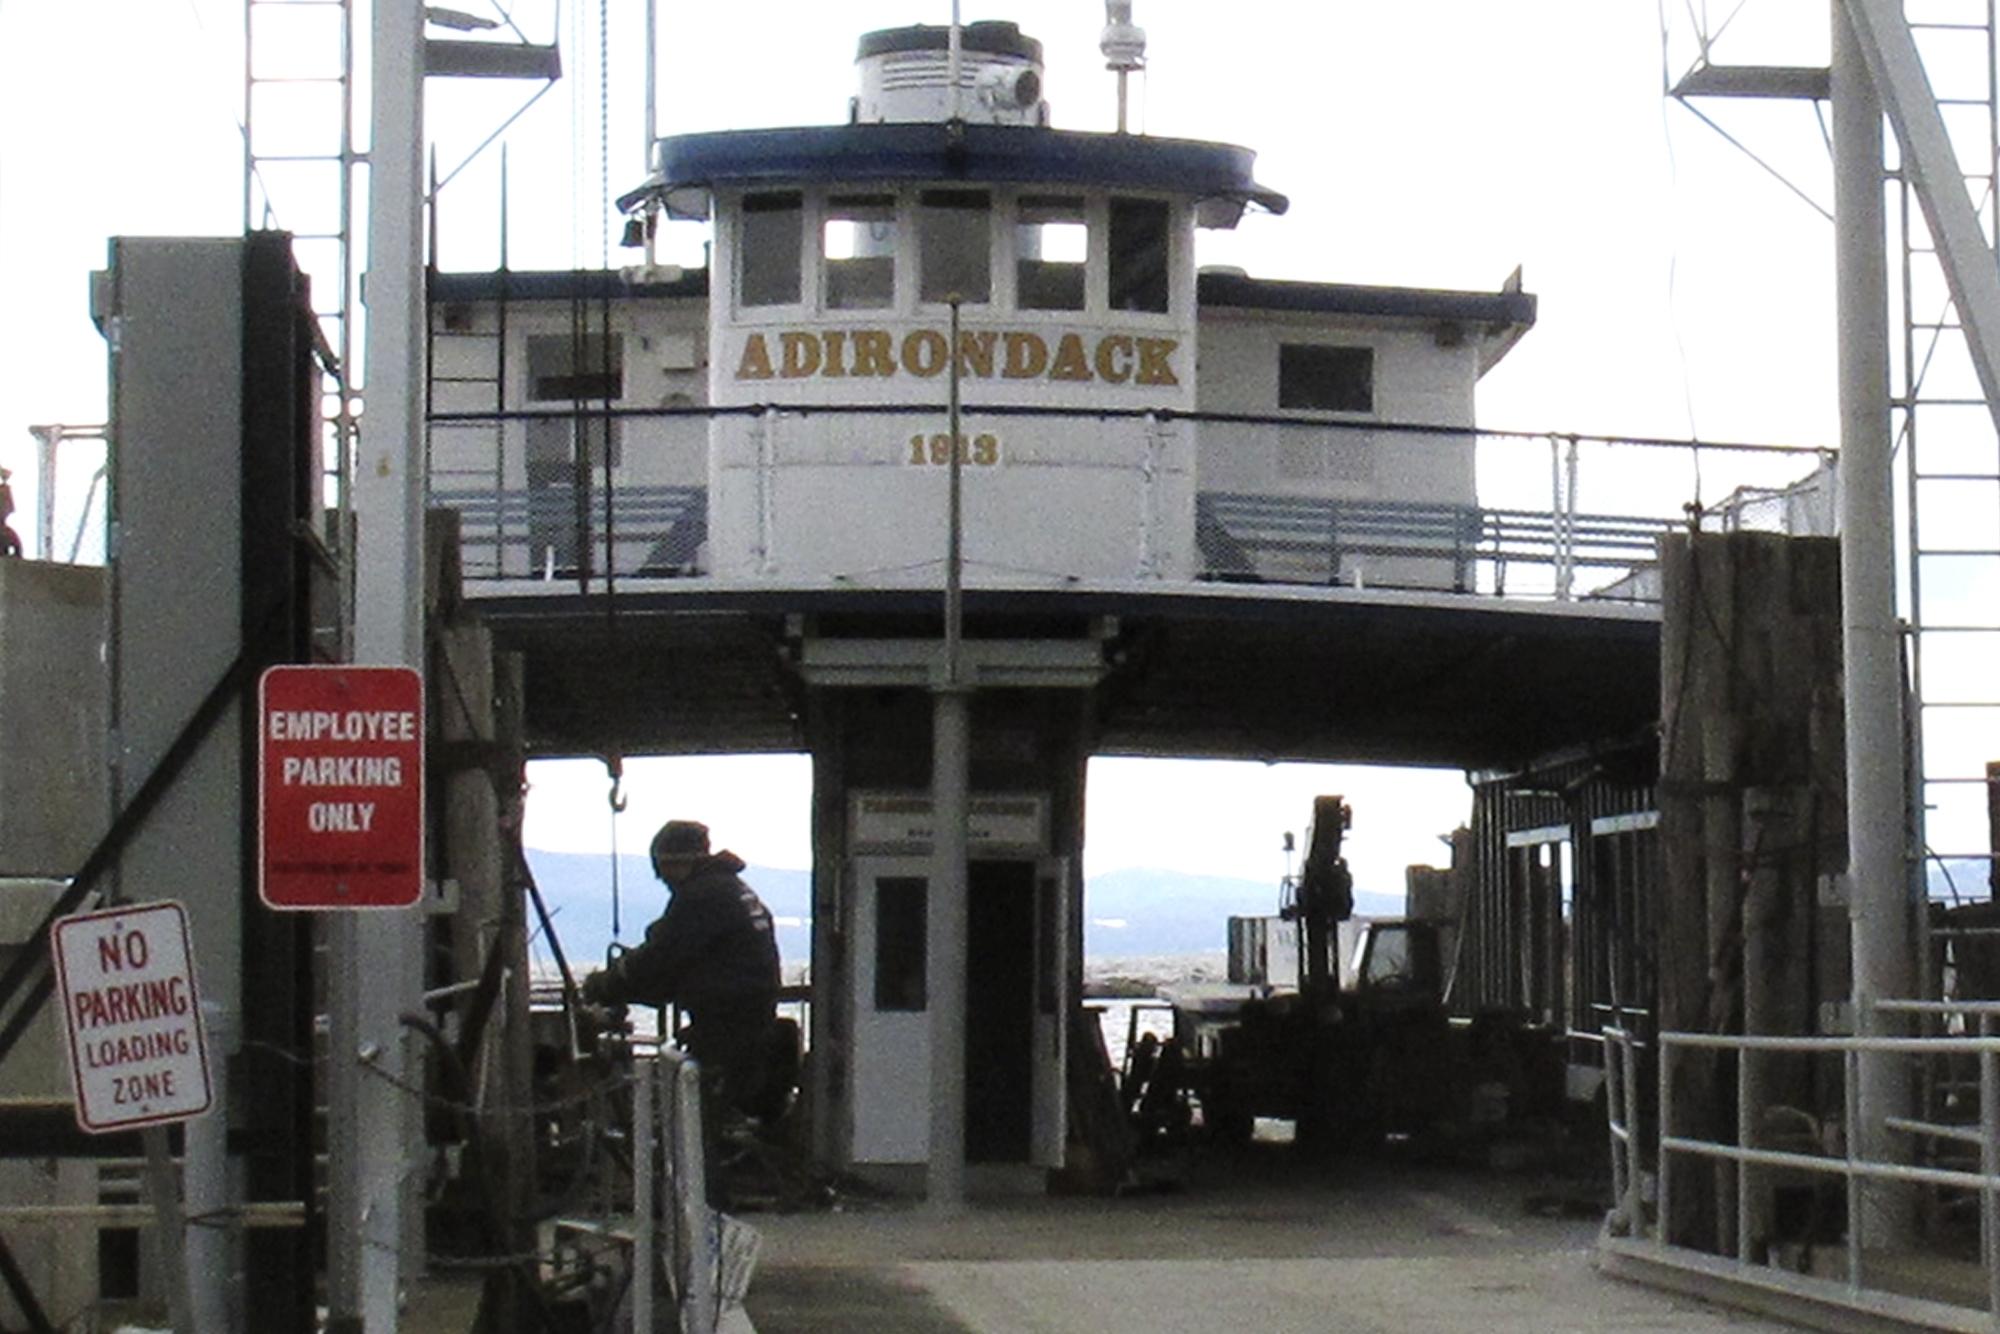 Adirondack Ferry